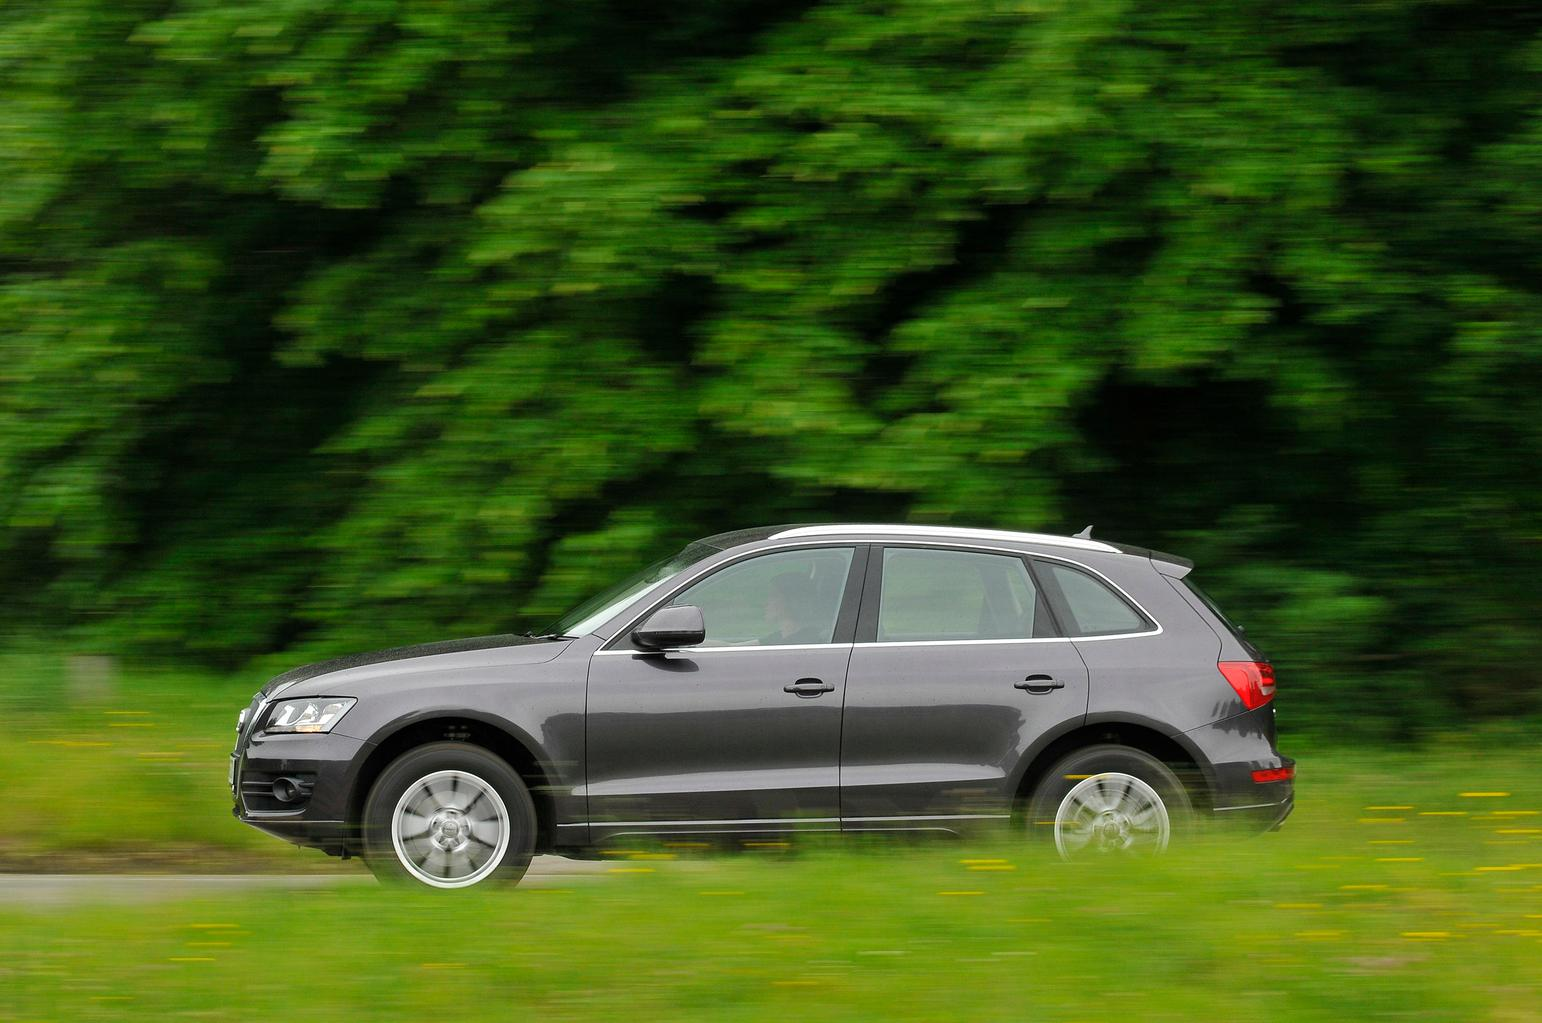 7 reasons to buy an Audi Q5